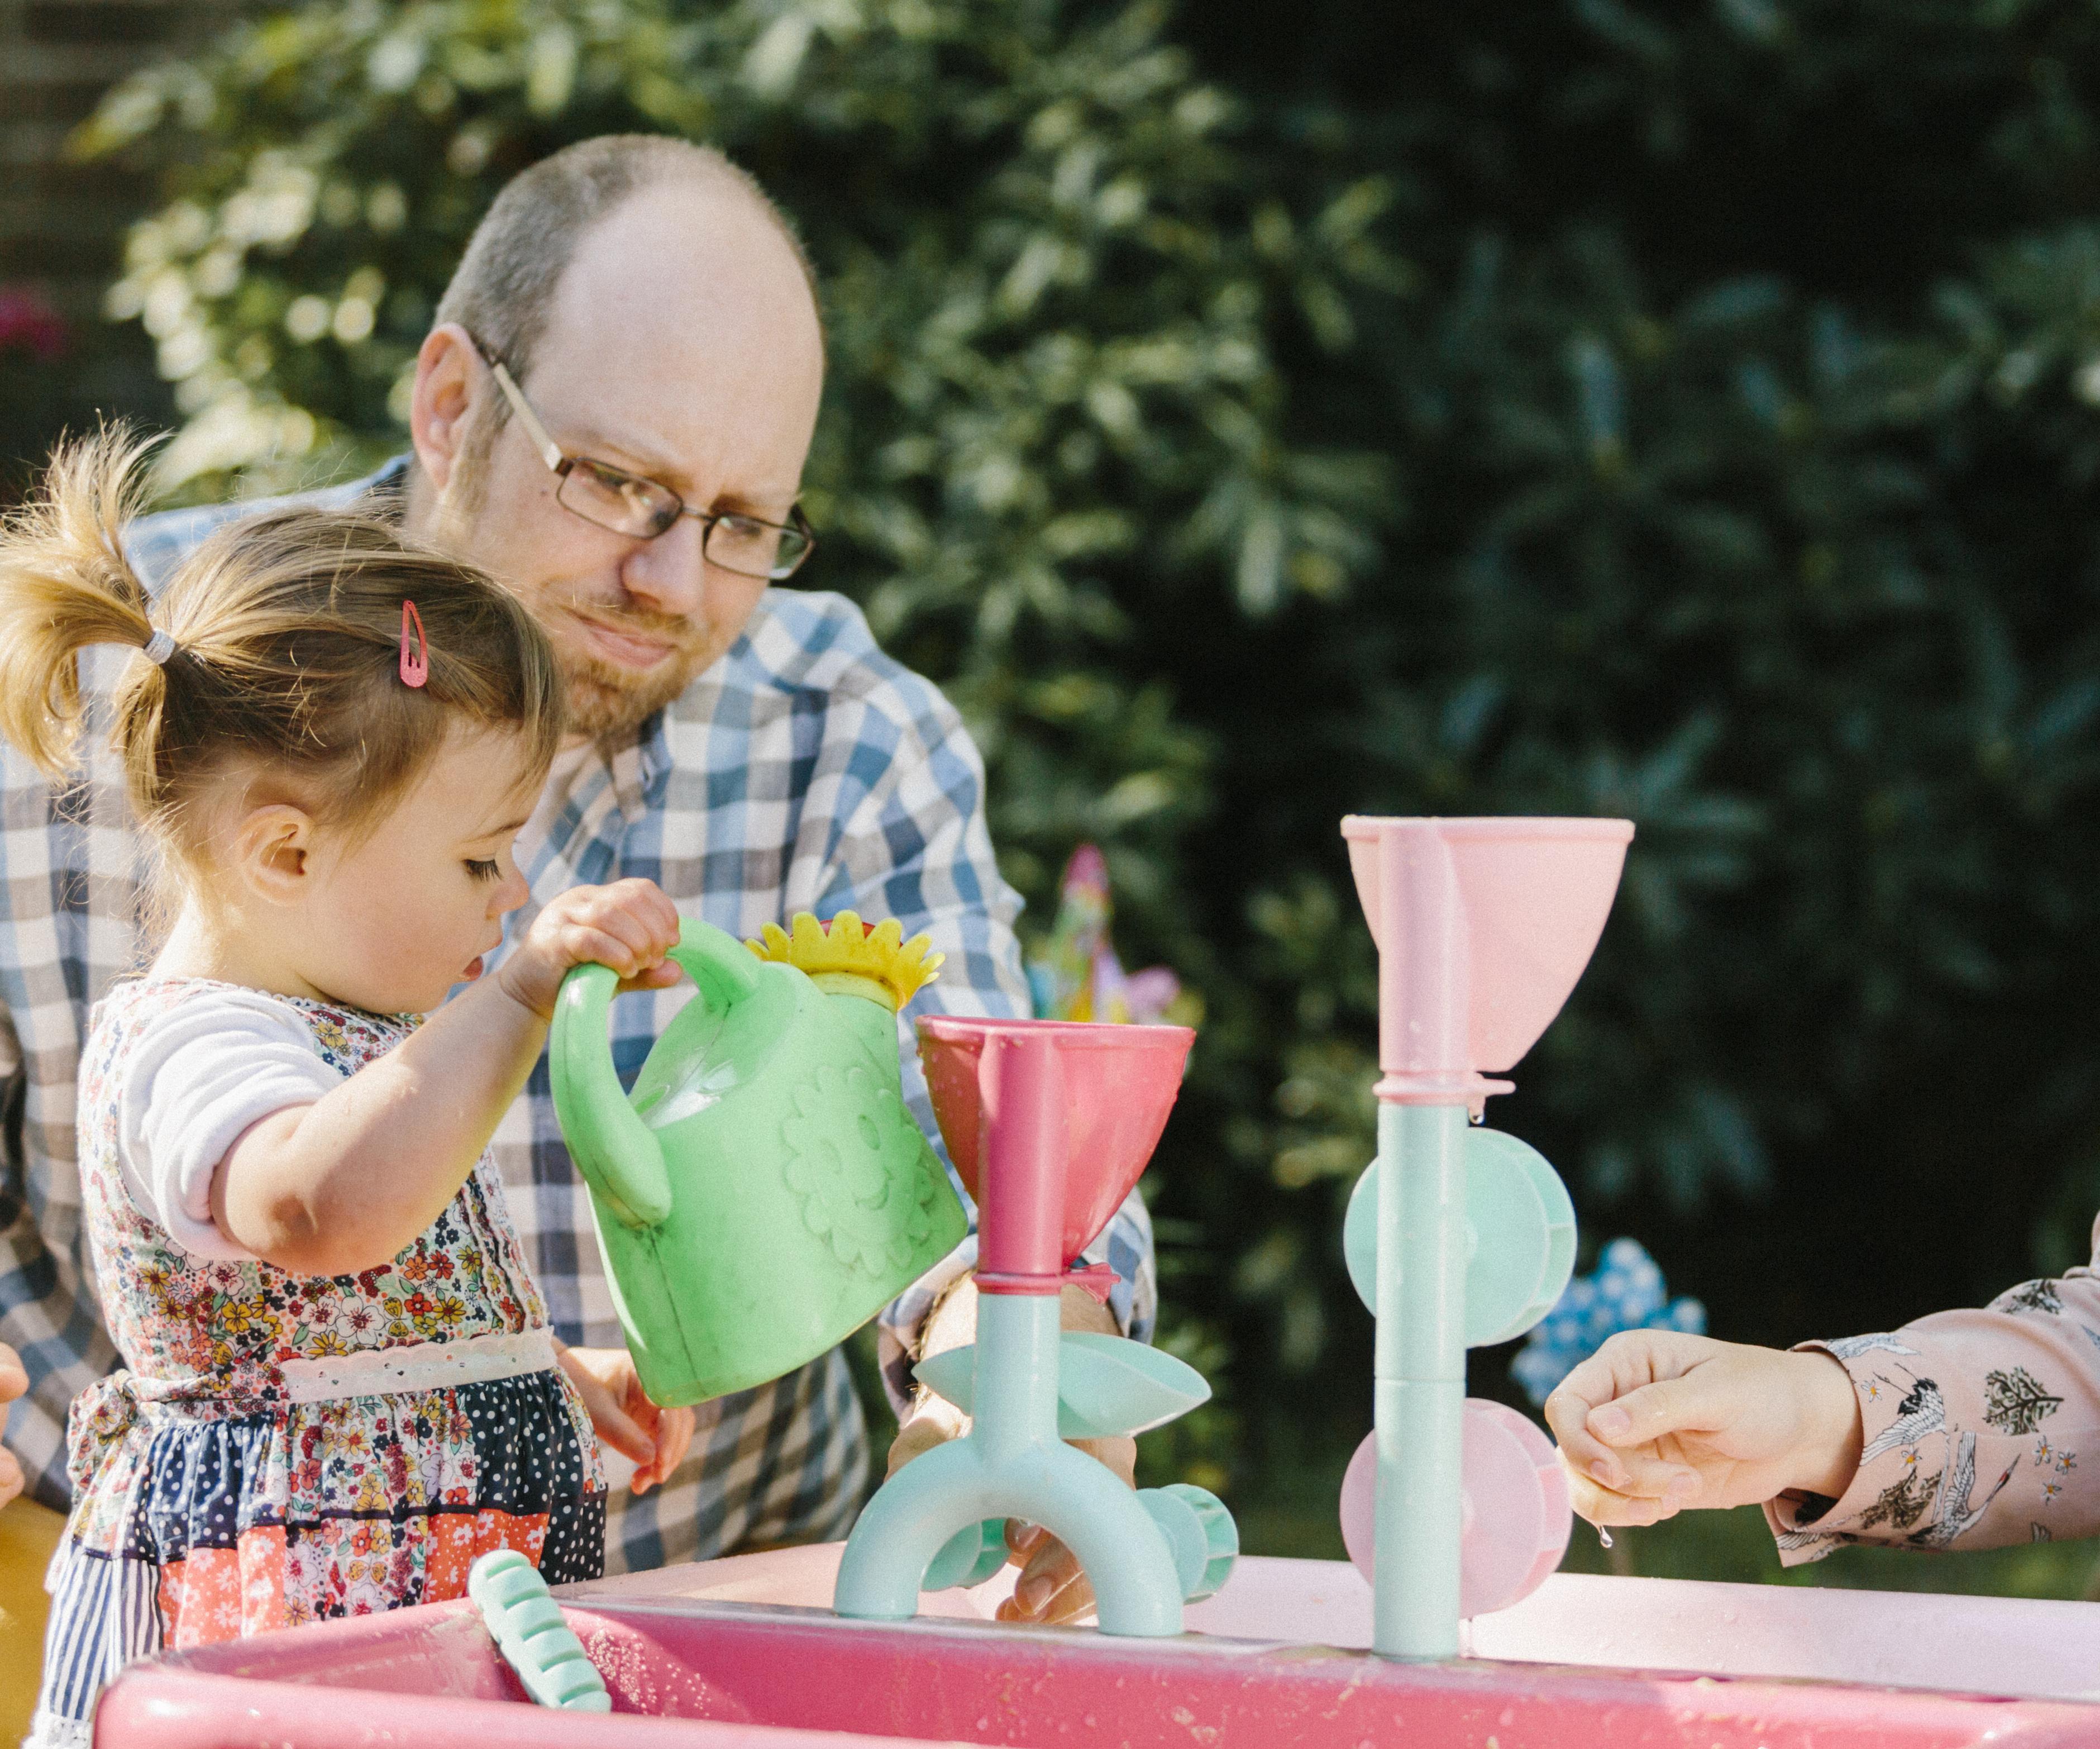 The unexpected plus of parenting with autism Spectrum